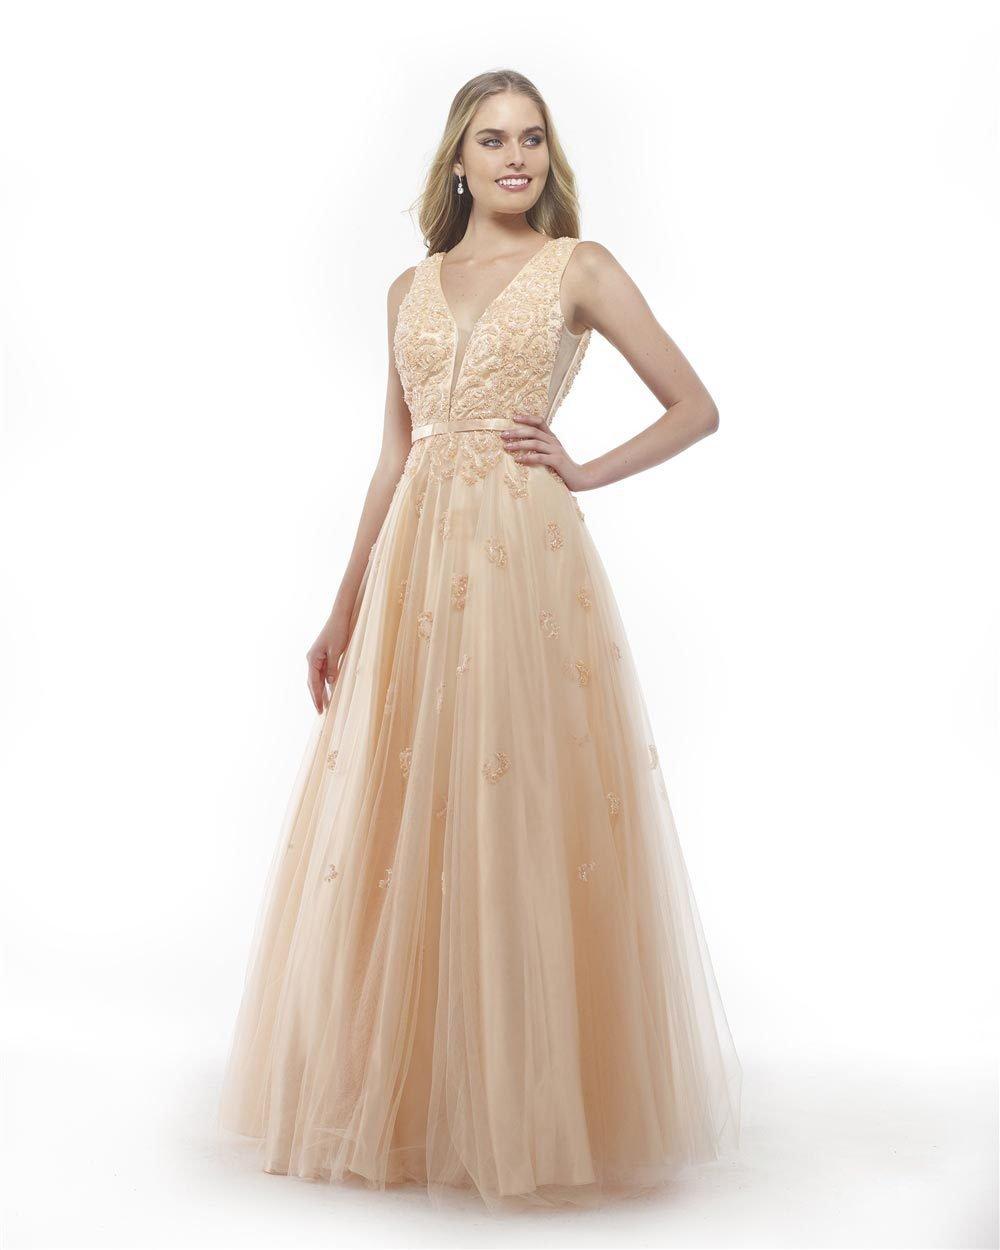 Morrell Maxie - 15851 Deep V-Neck Embellished Net Gown